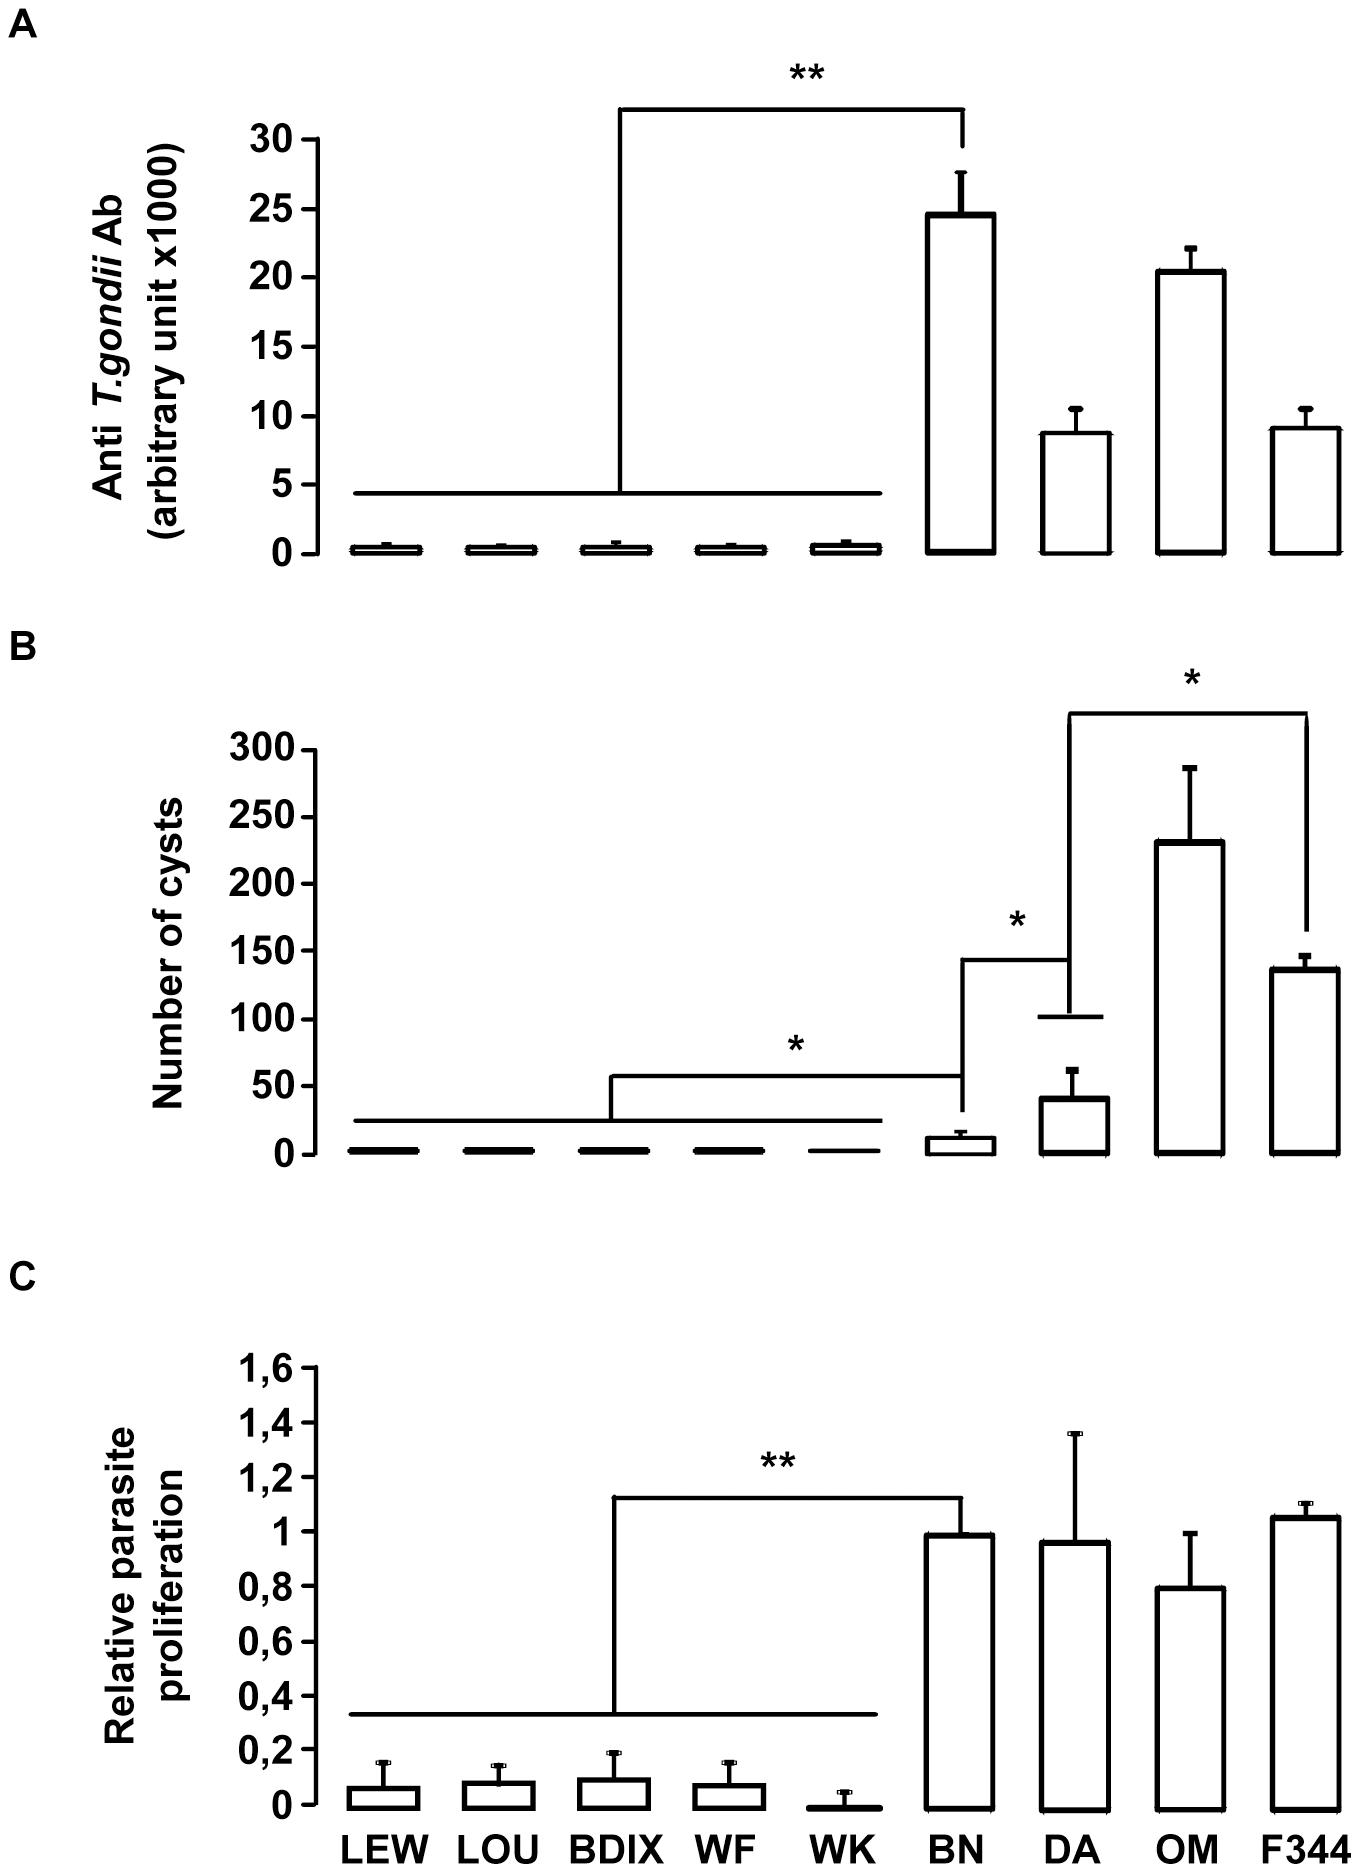 <i>In vivo</i> and <i>in vitro</i> phenotypes of the nine inbred strains following <i>T. gondii</i> infection.